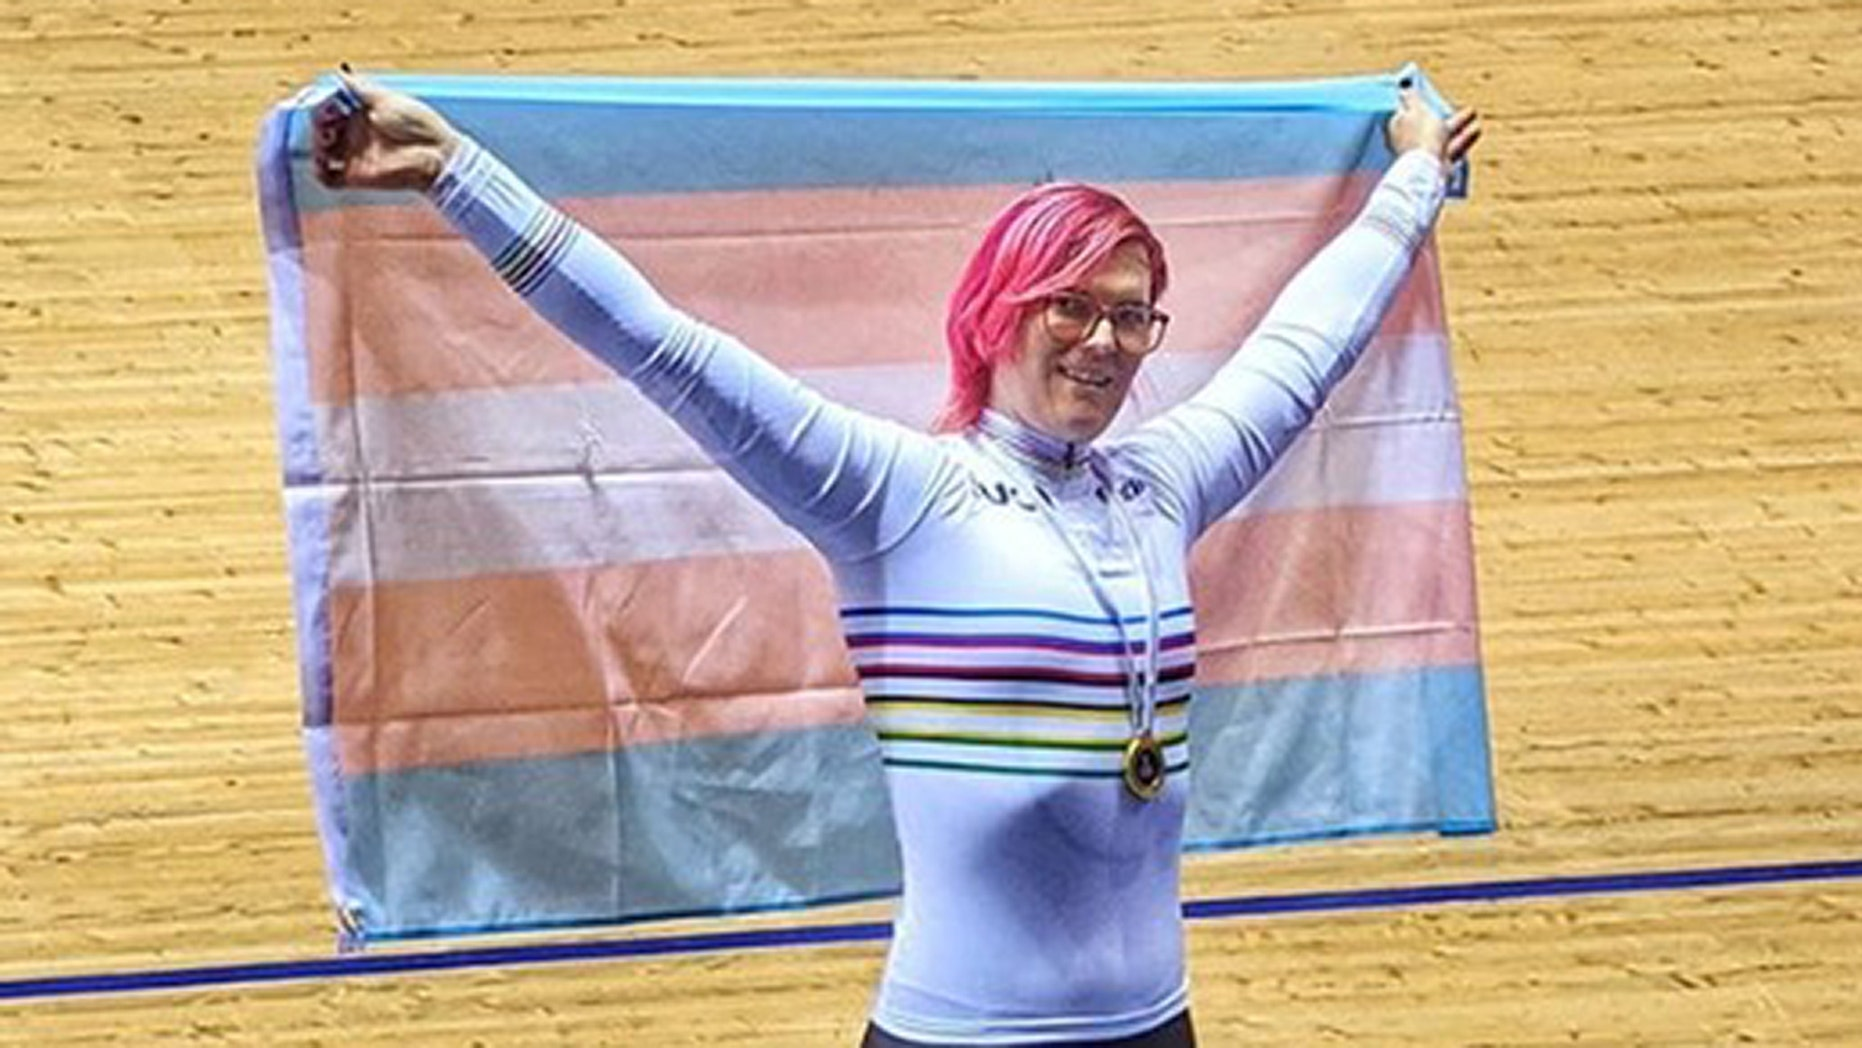 Westlake Legal Group Rachel-McKinnon-THUMB Transgender cyclist Rachel McKinnon dominates, competitors raise questions New York Post fox-news/sports fnc/sports fnc cc5088ad-4001-5397-8d45-20a3bd0bb80d article